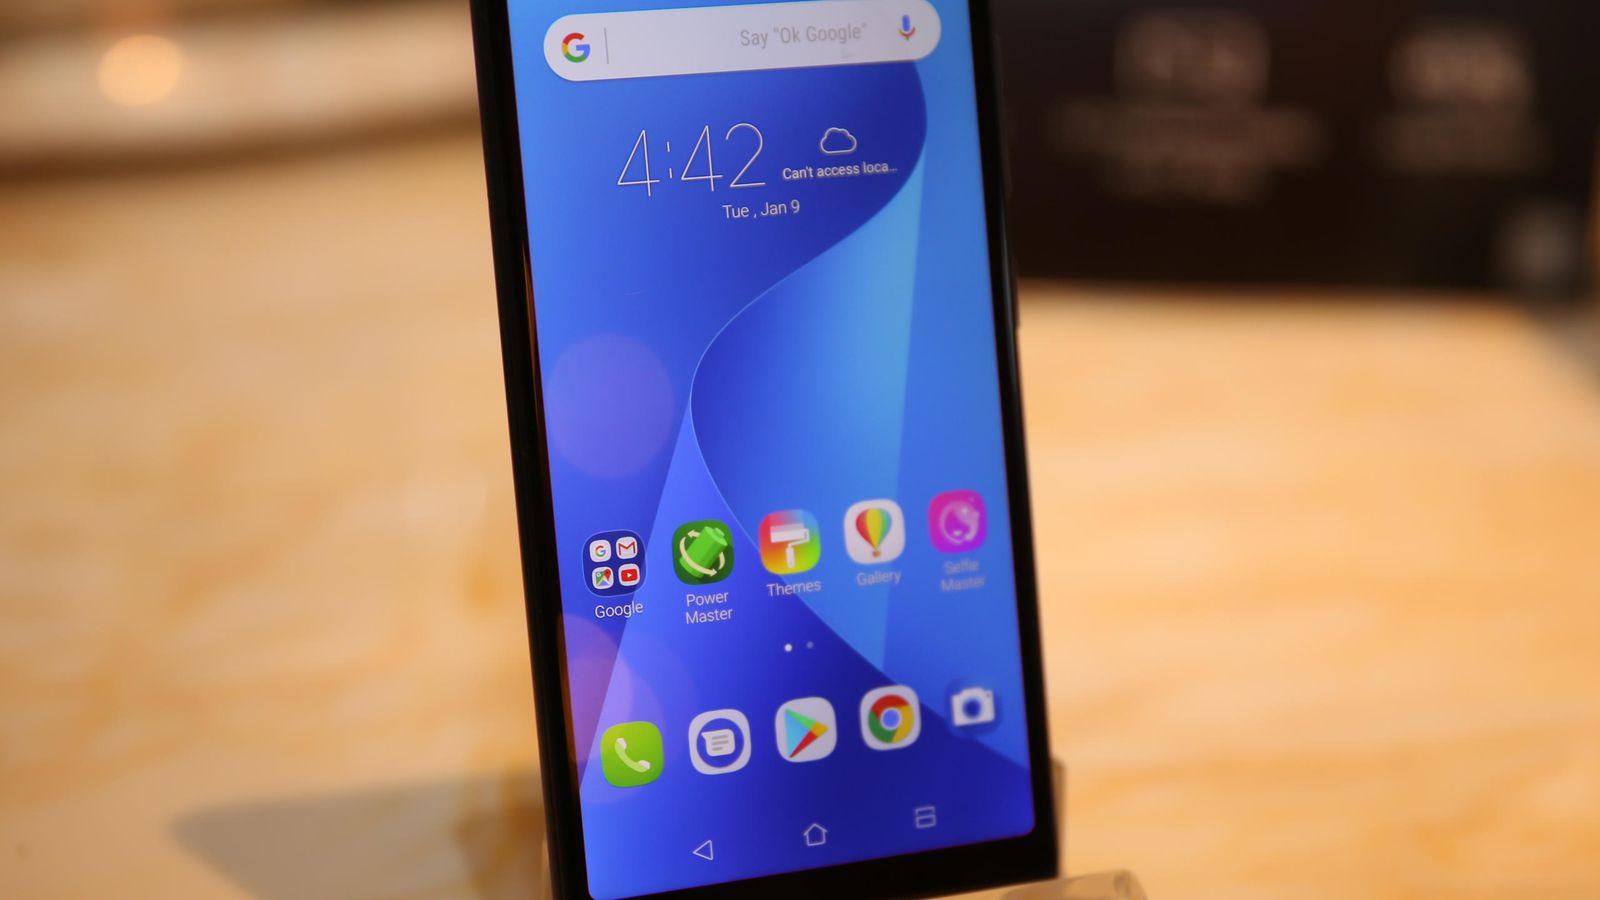 asus-zenfone-max-plus-product-photos-5 - Best Smartphone